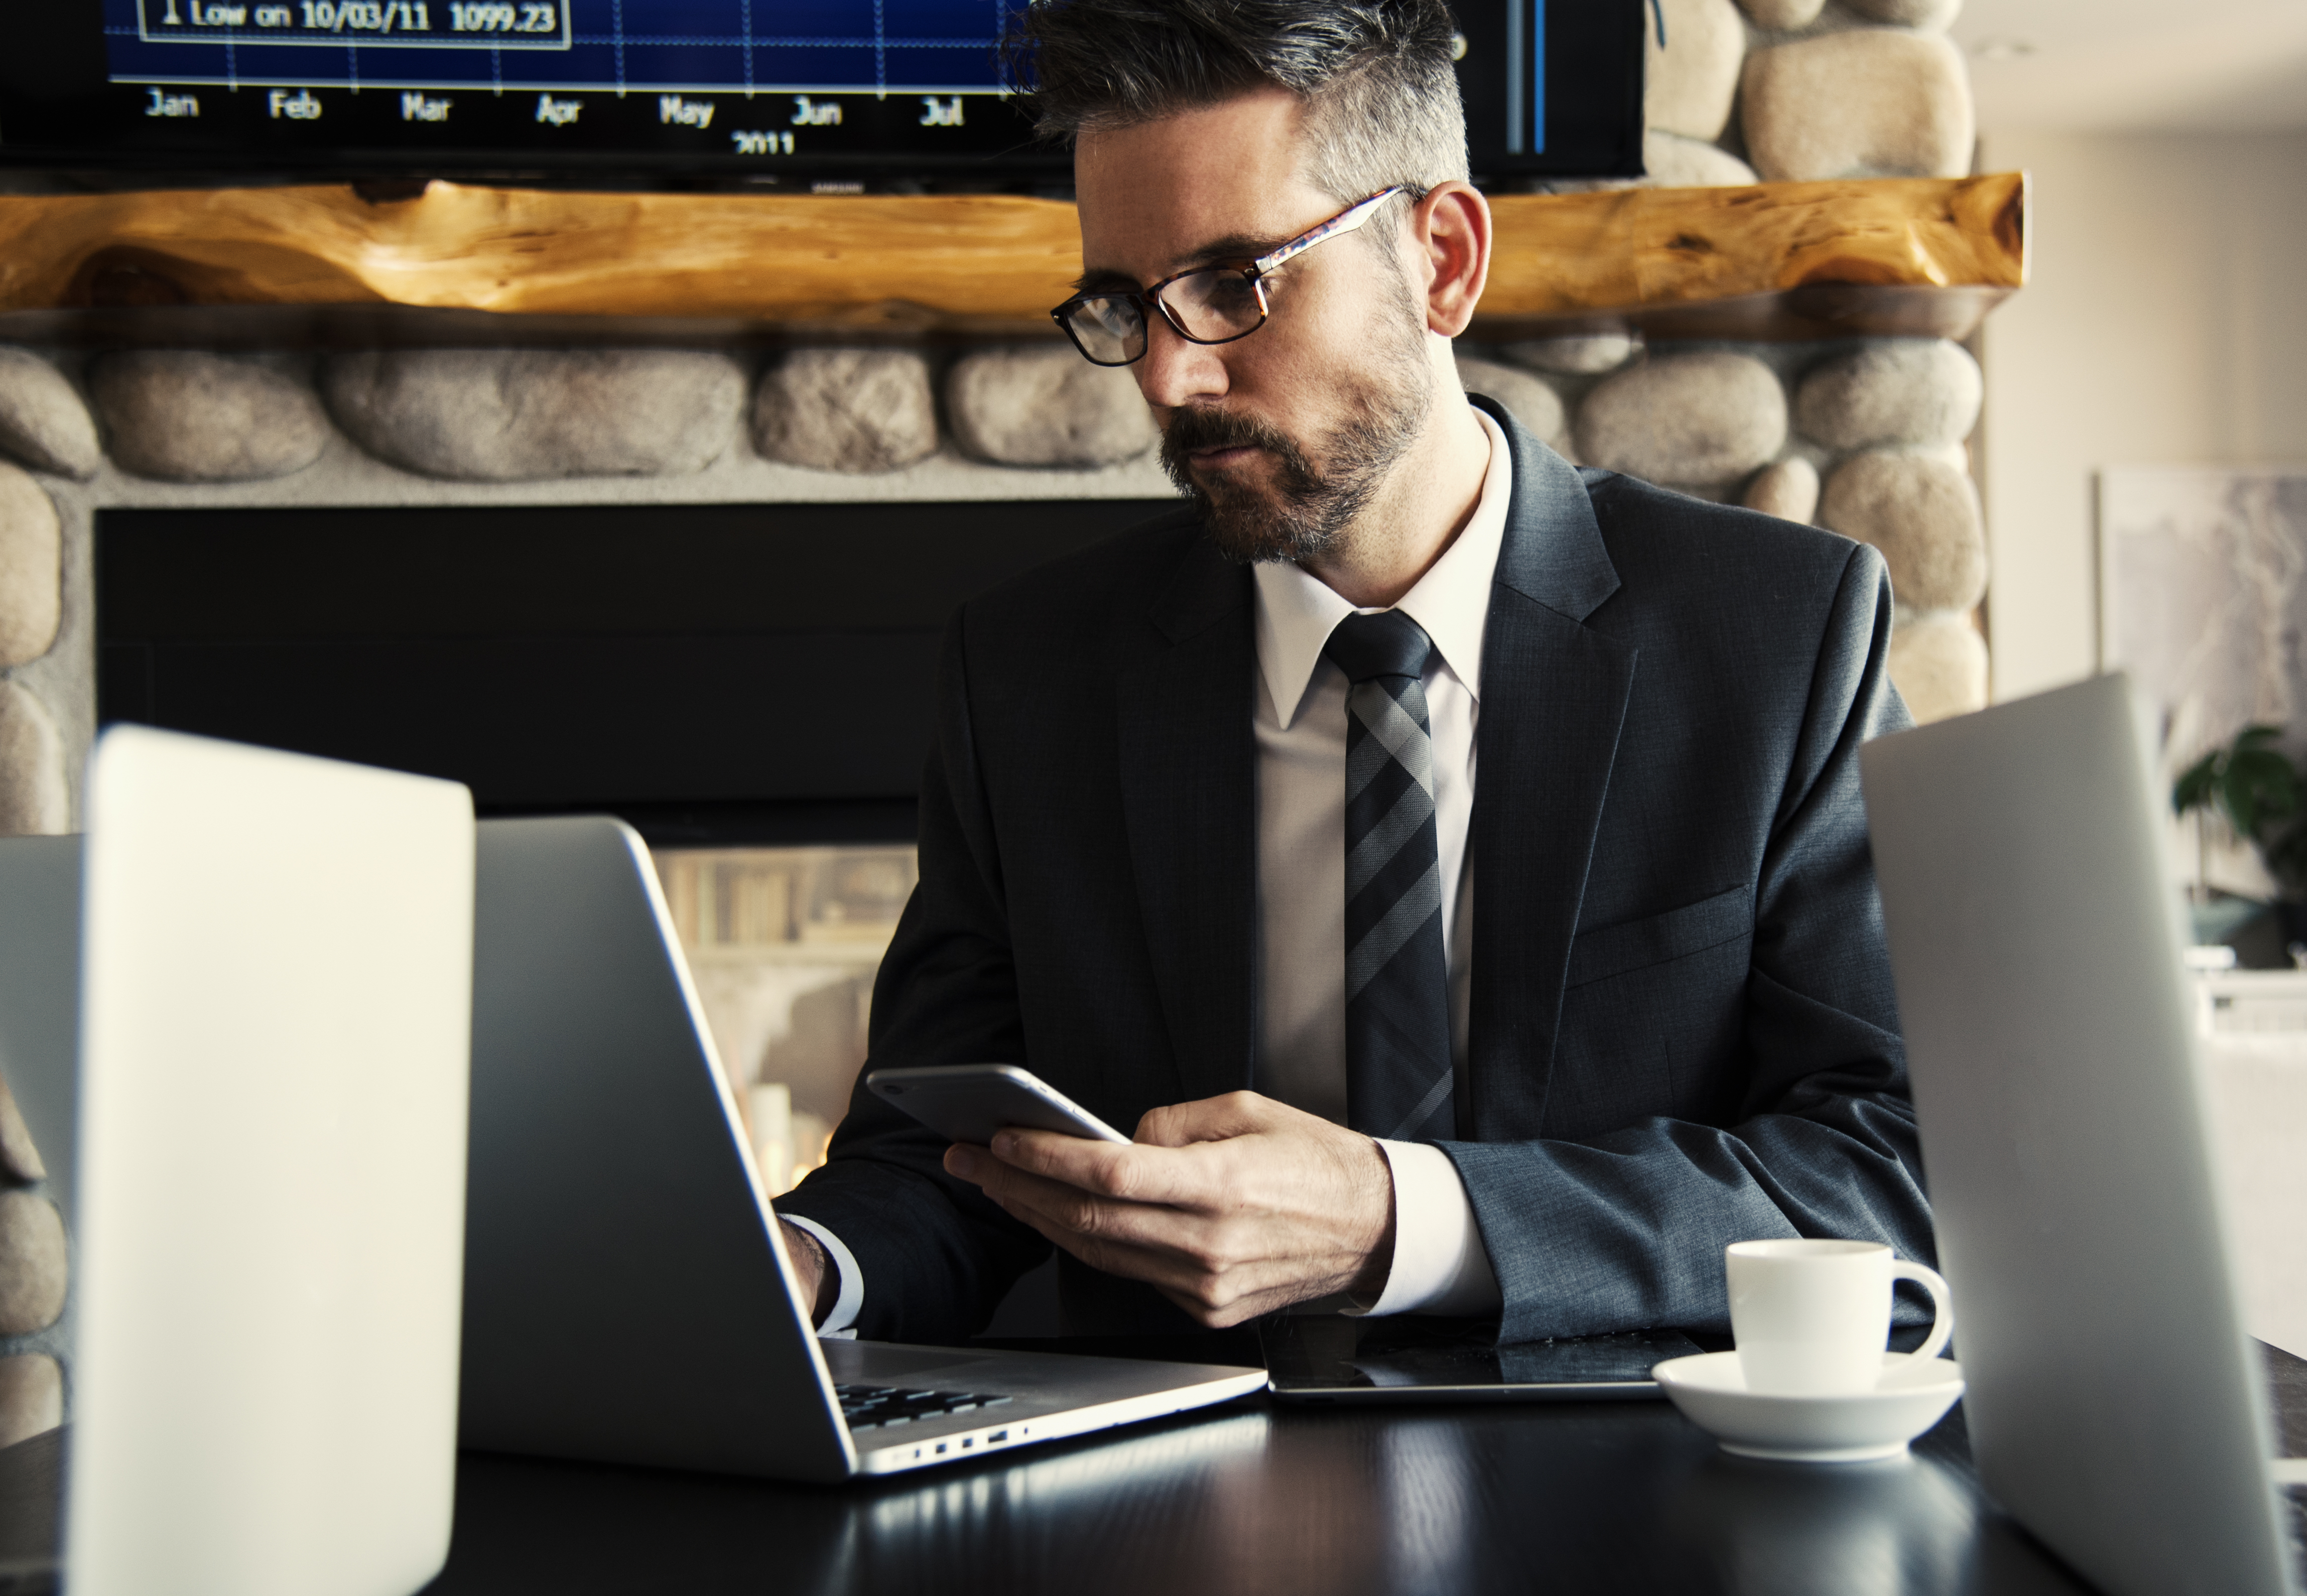 Employee Handbook Cellphone Usage